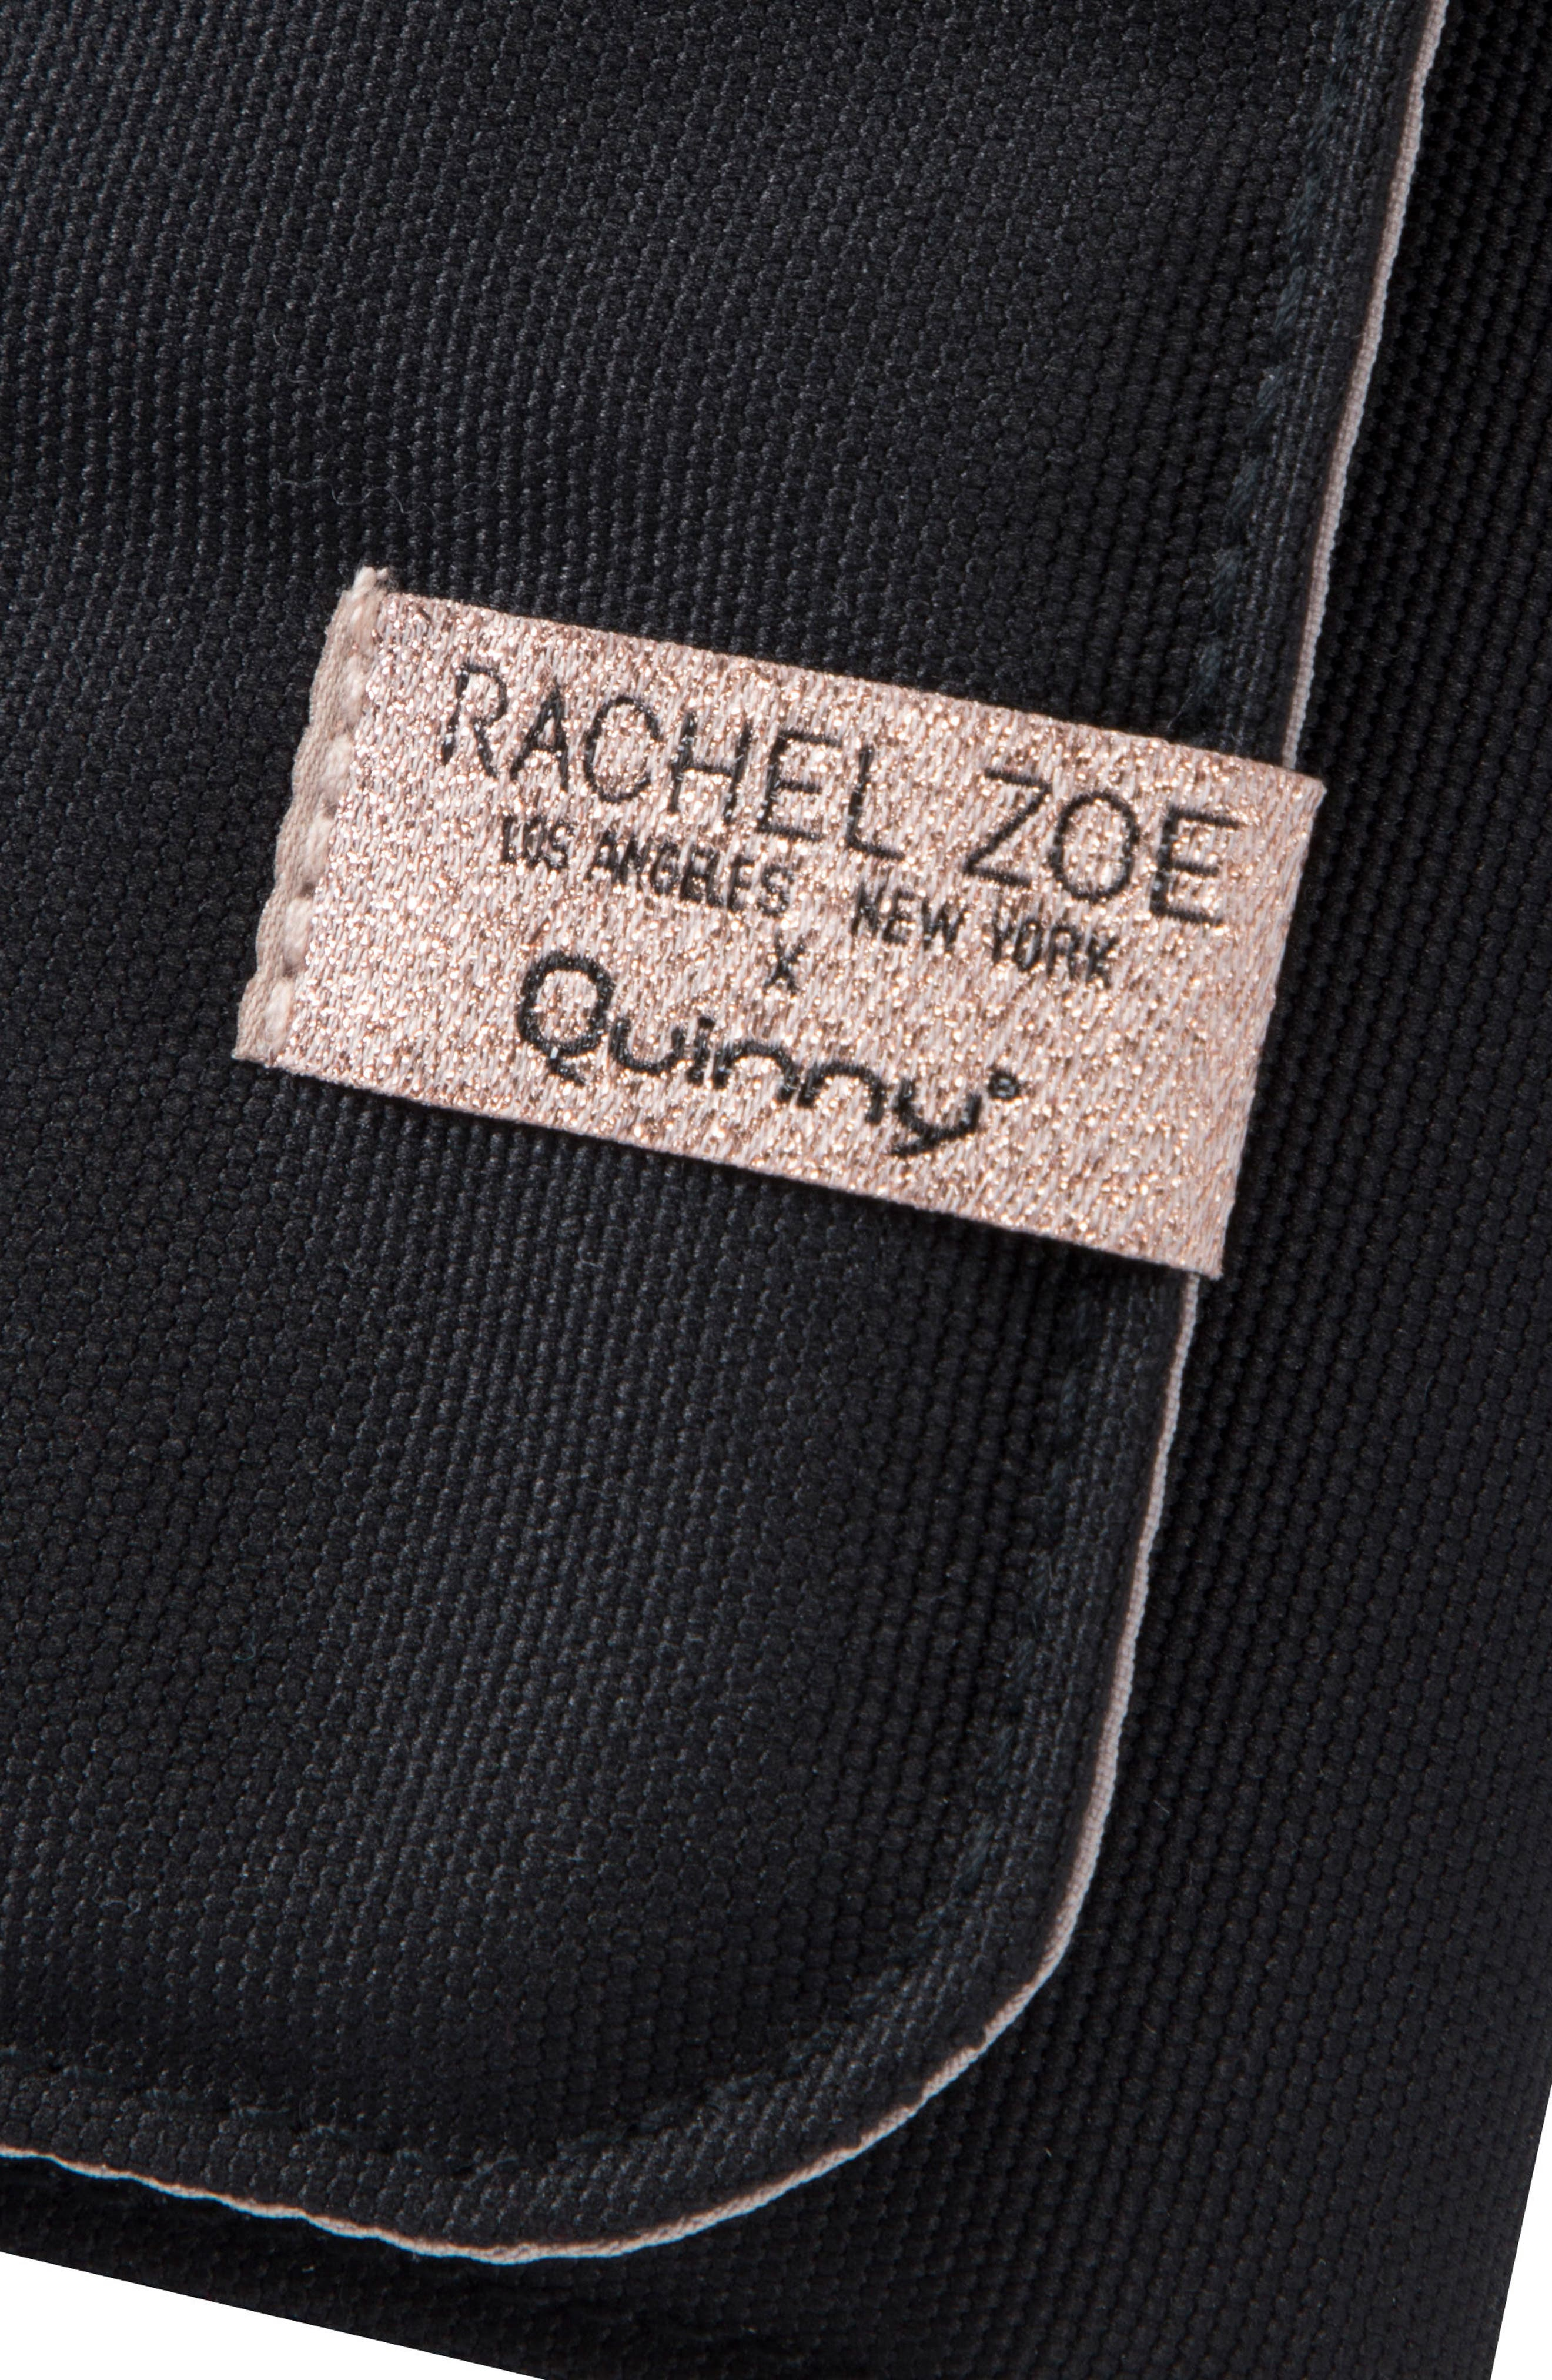 x Rachel Zoe Luxe Sport Diaper Bag,                             Alternate thumbnail 4, color,                             RZ LUXE SPORT